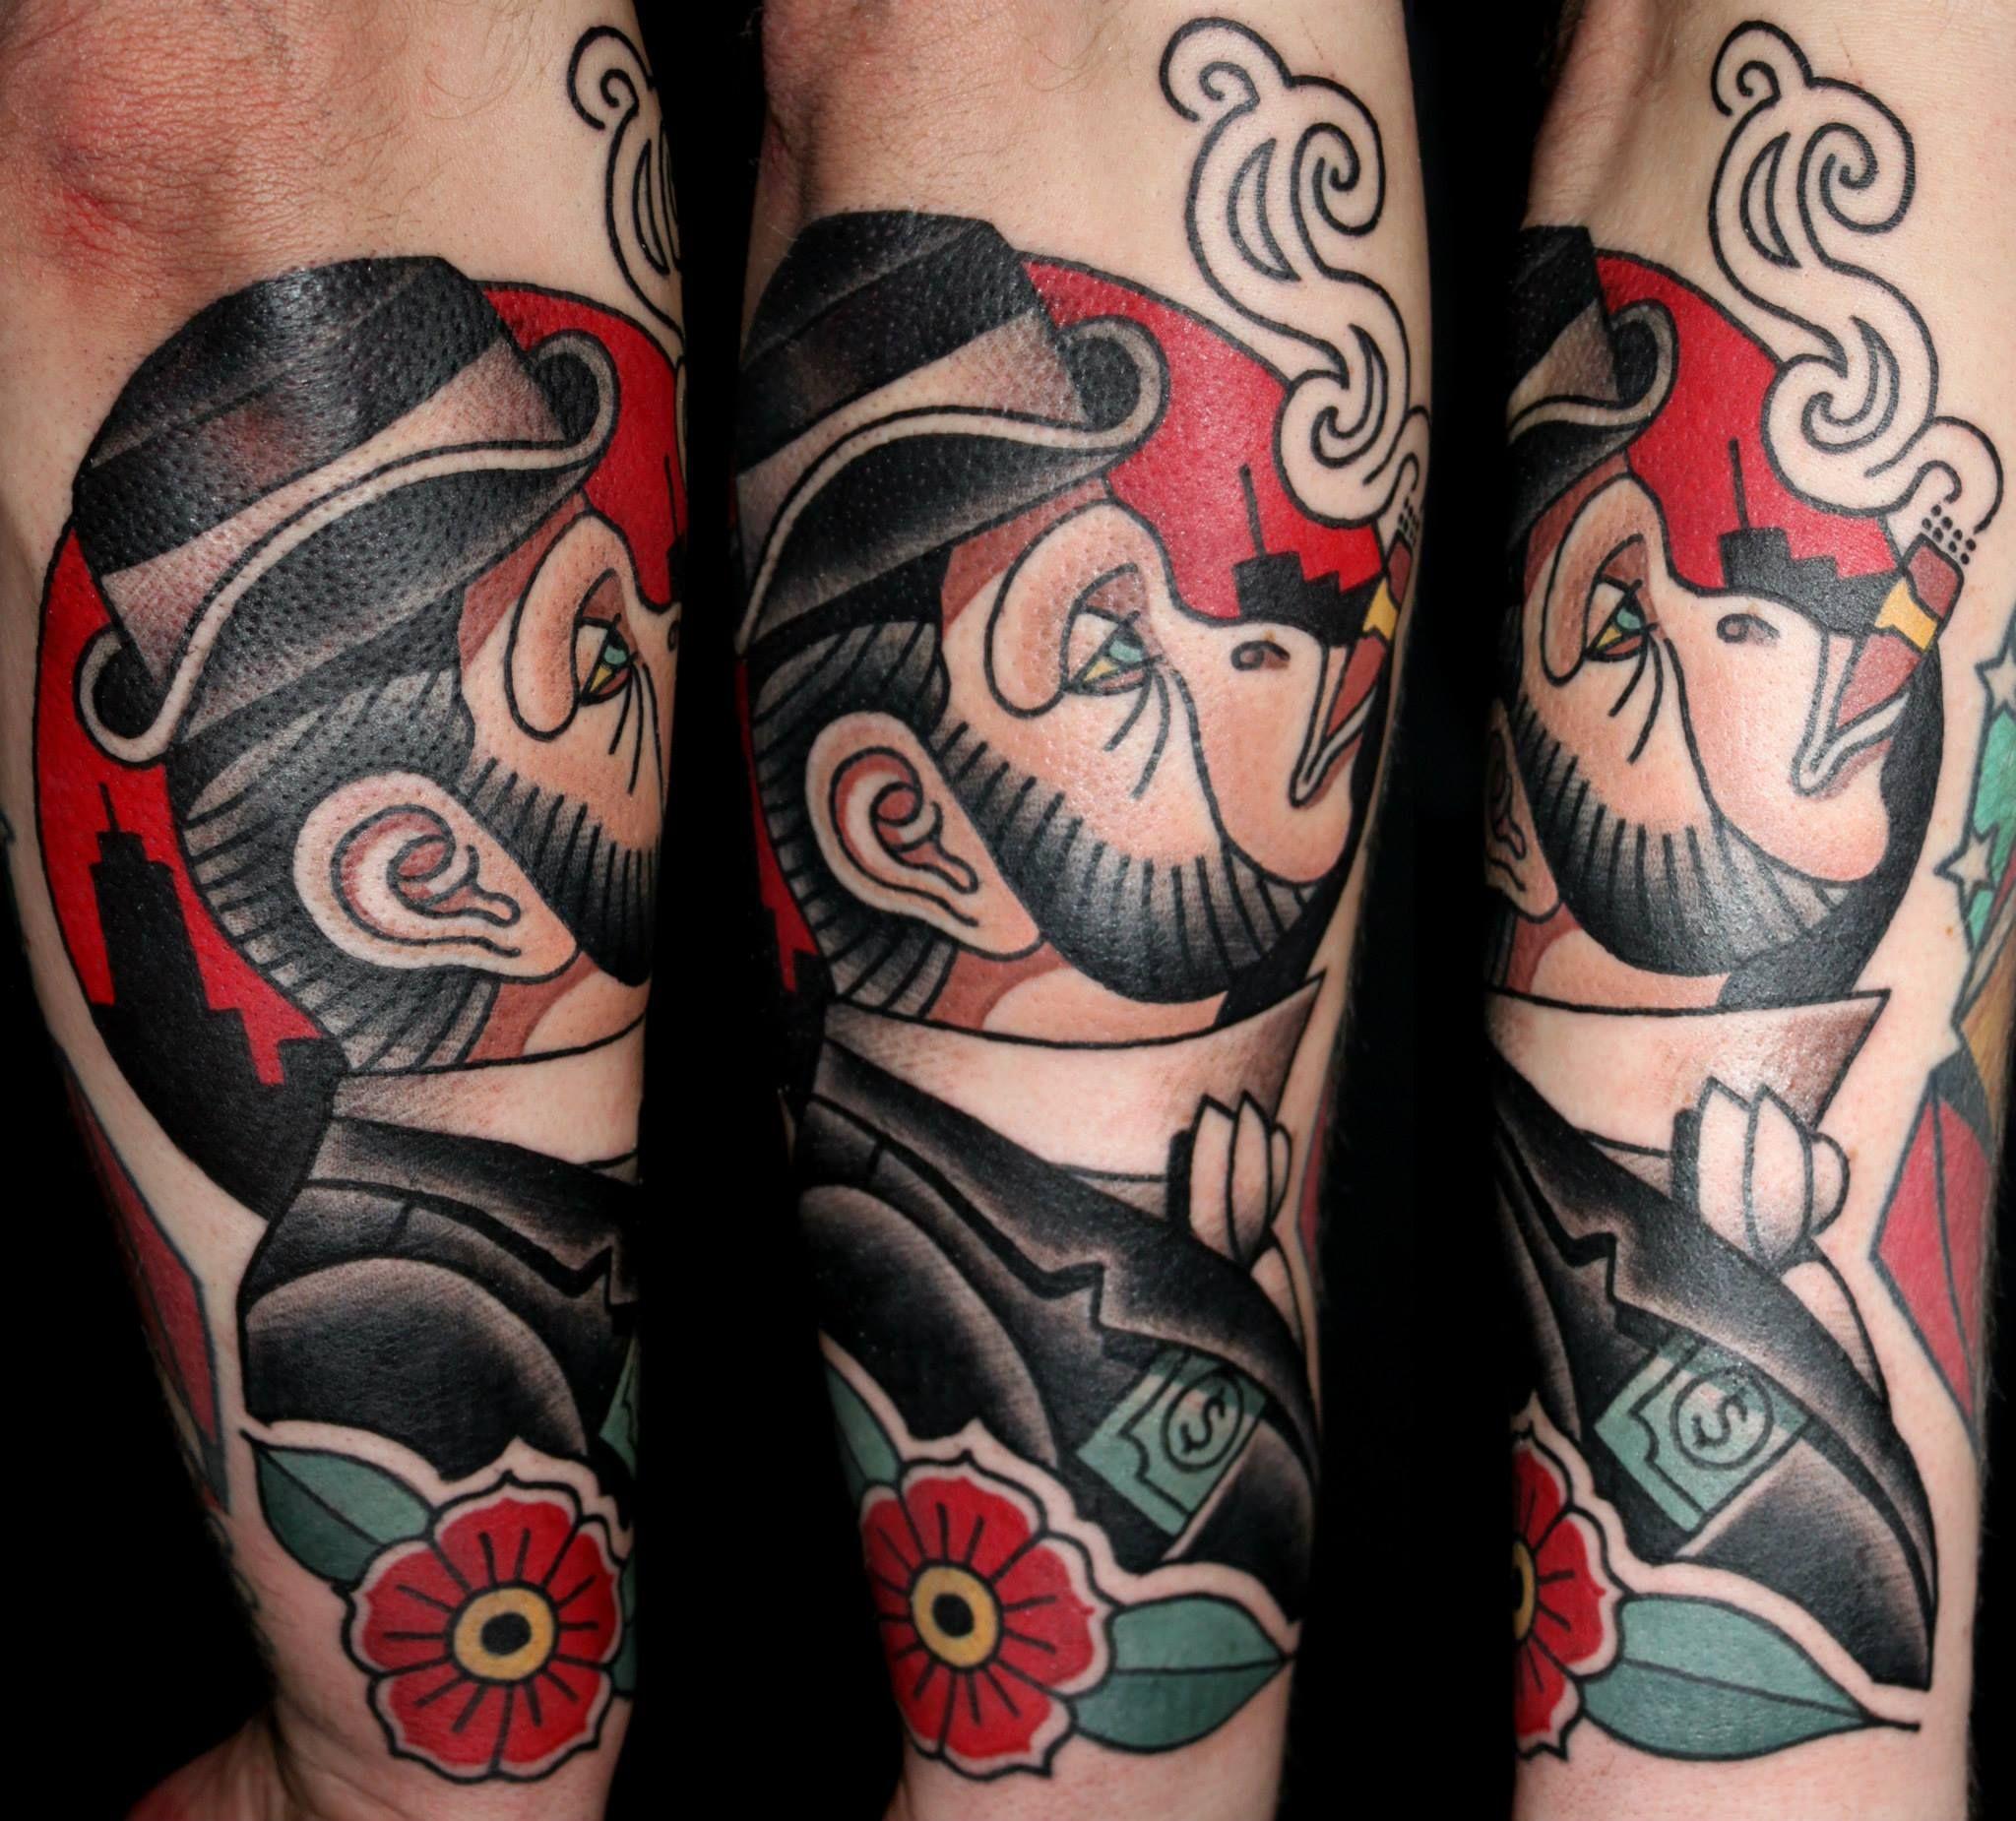 Tattoo ornament - ancient style of tattoos 81